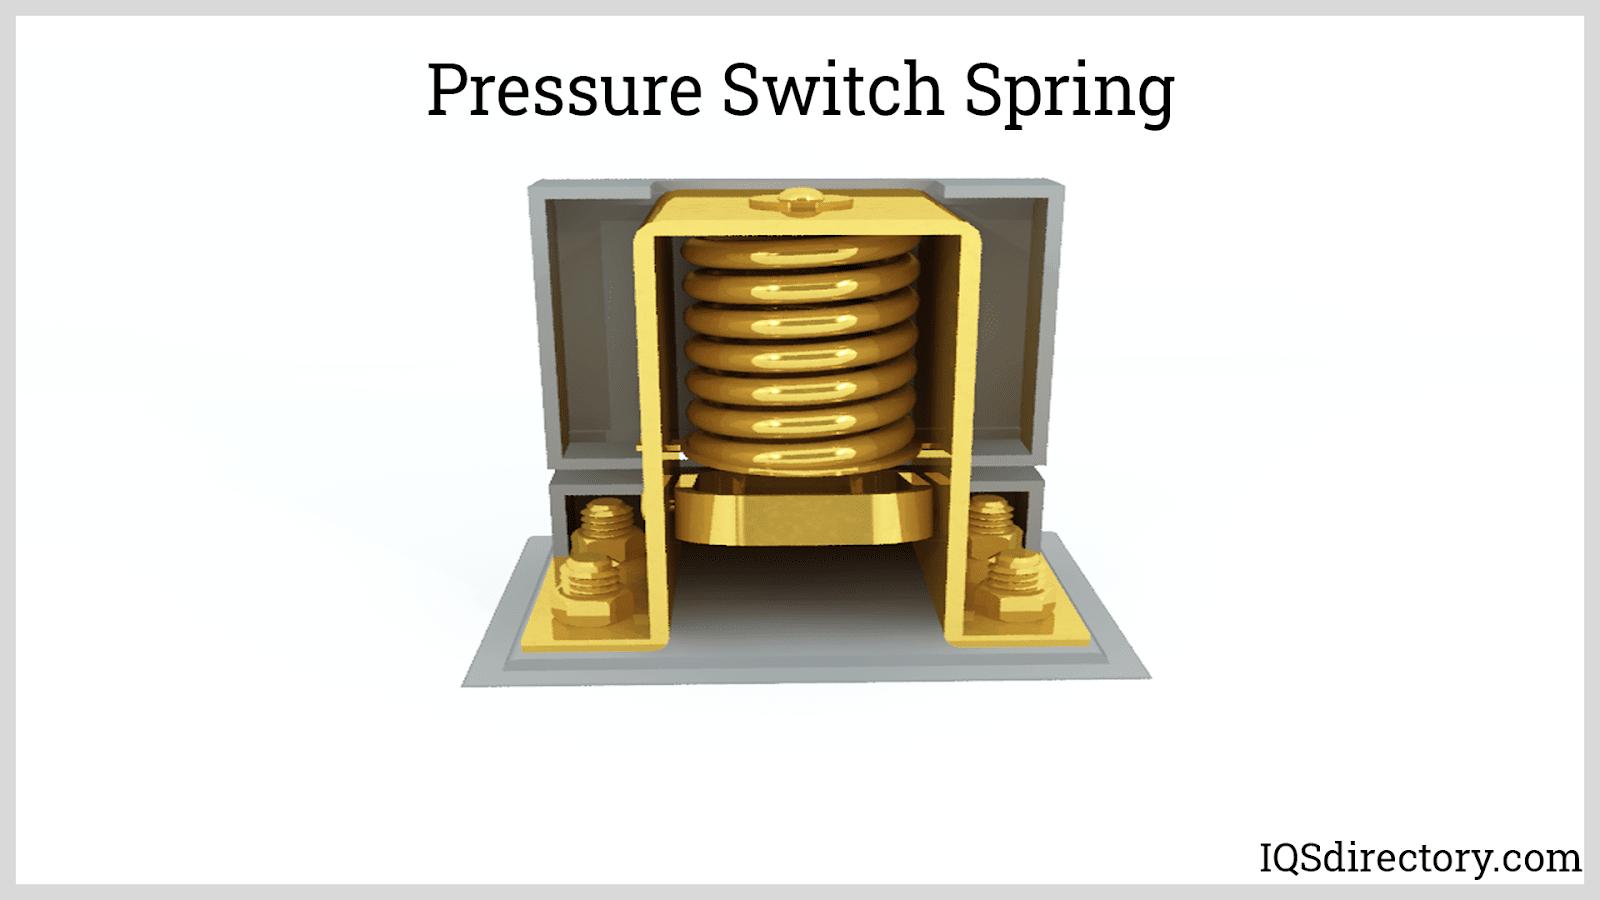 Pressure Switch Spring